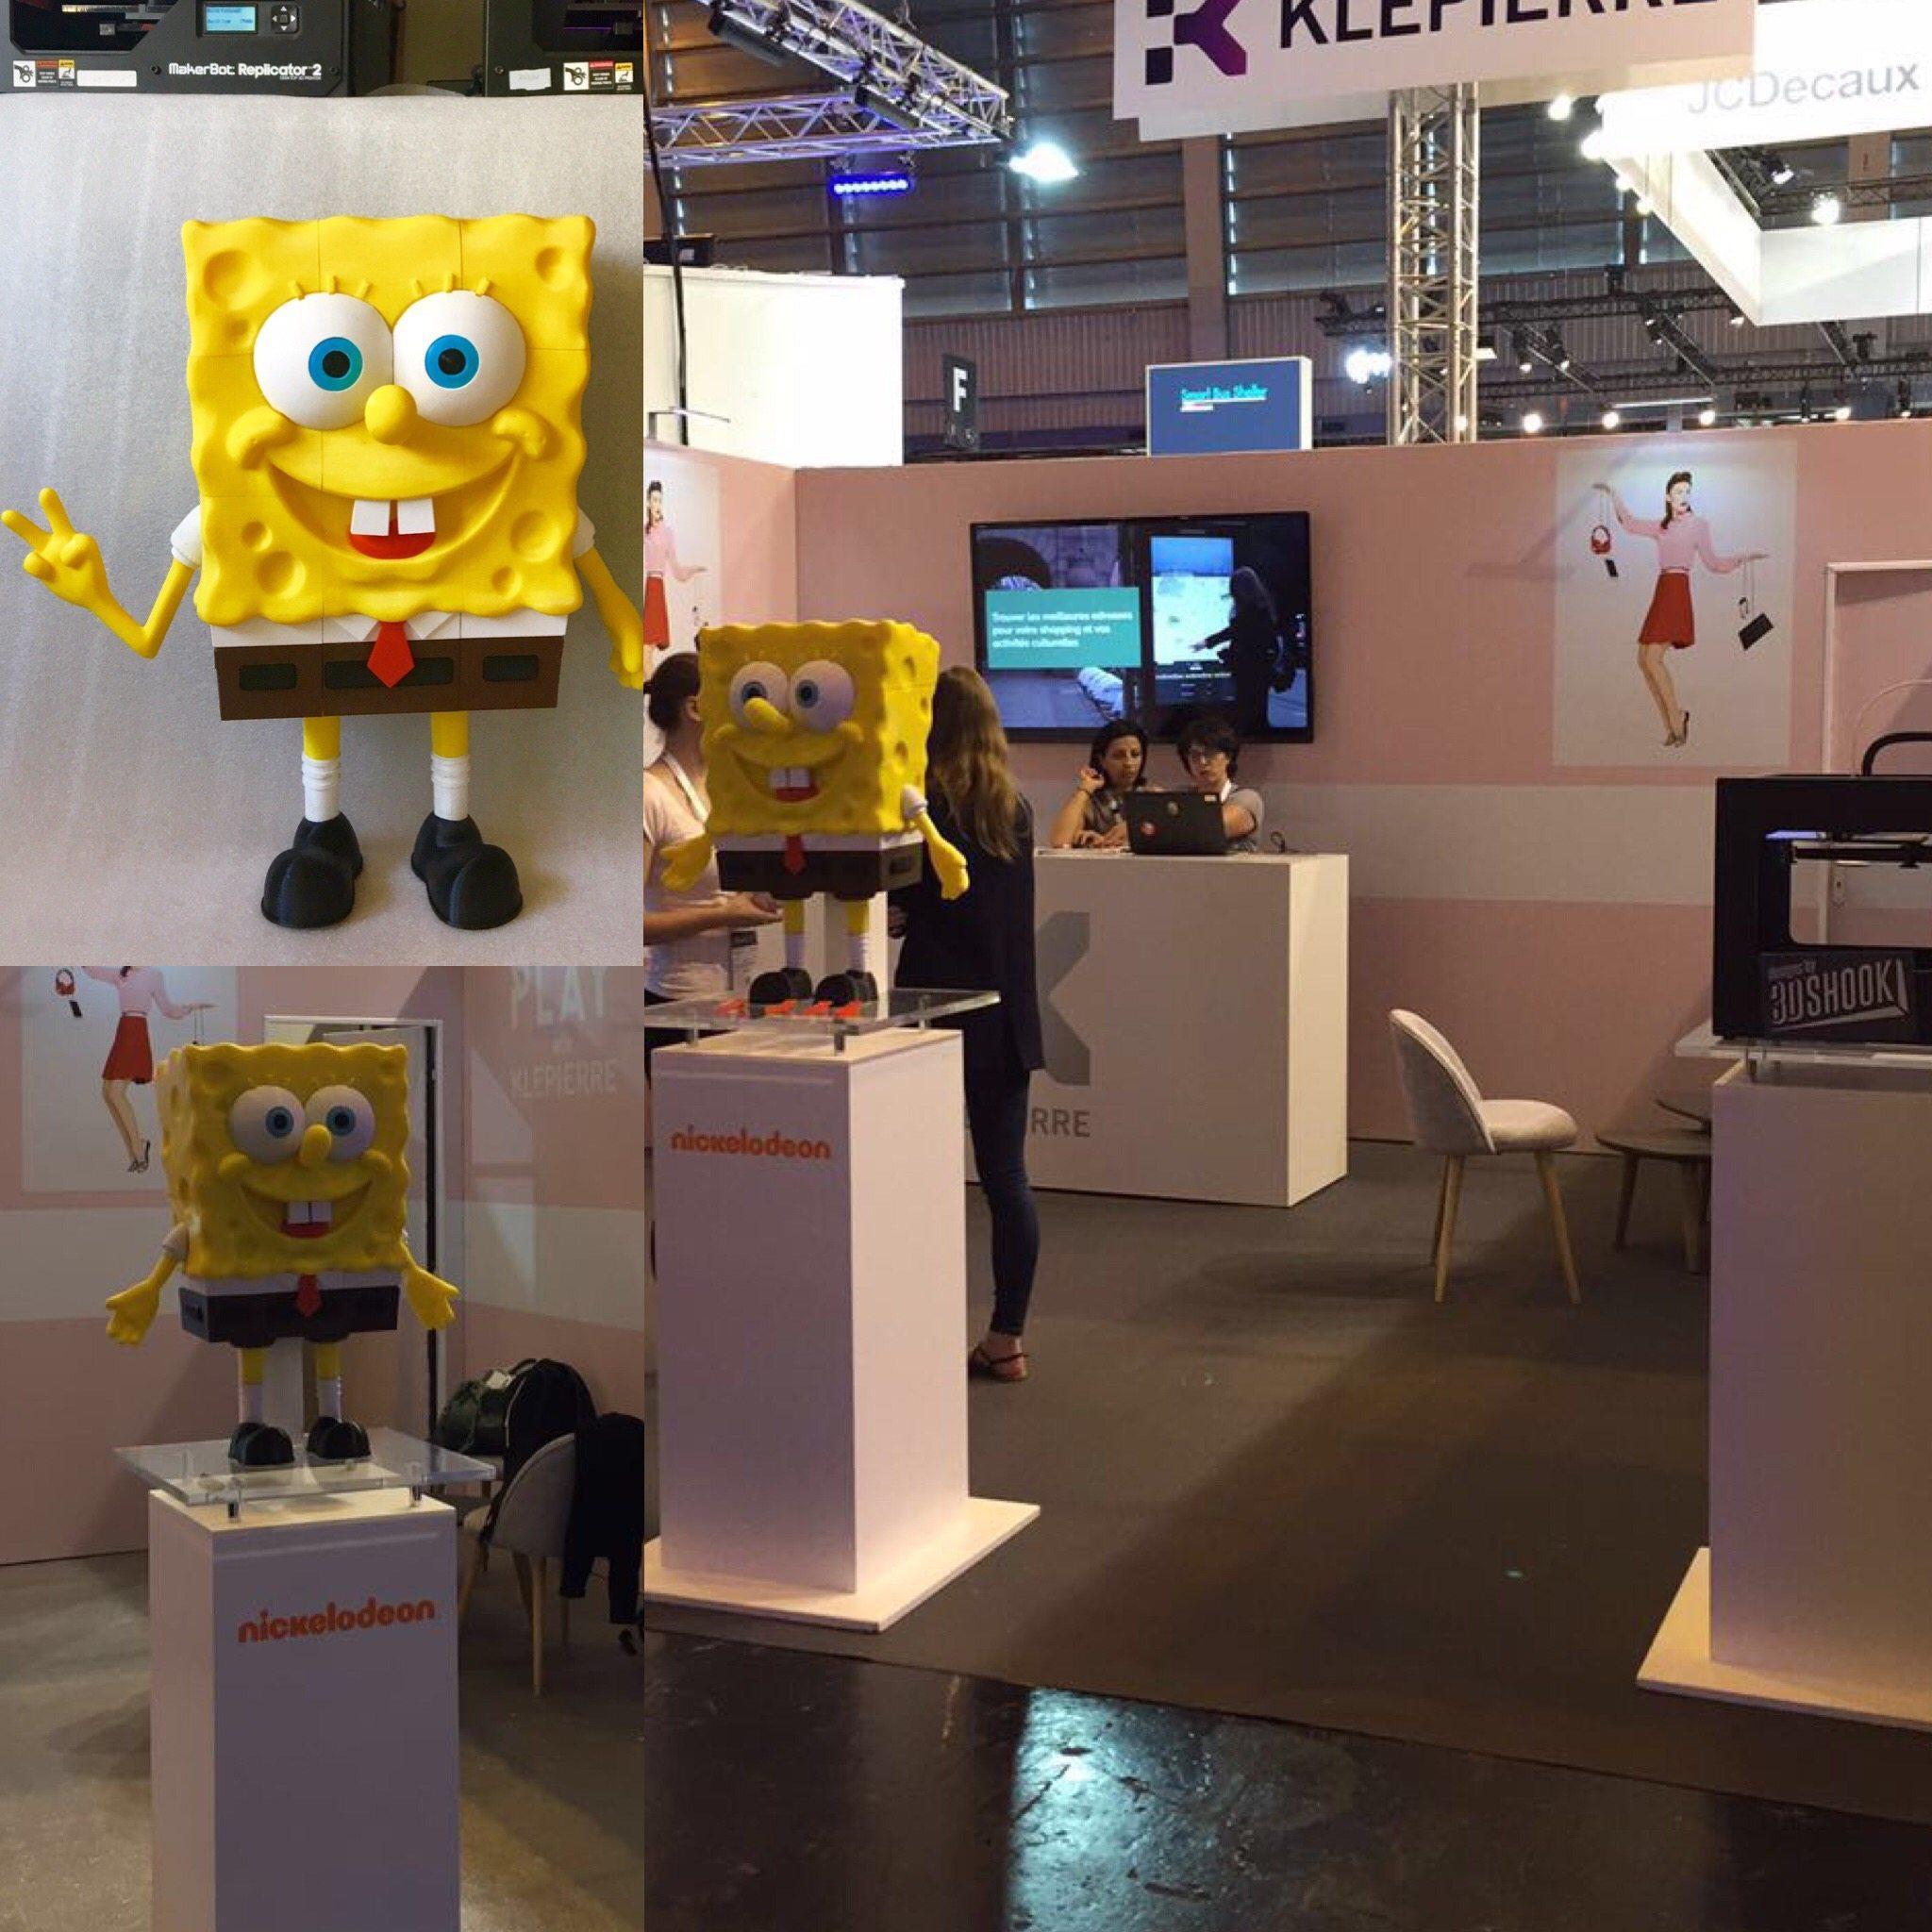 Giant 3D Printed Spongebob!